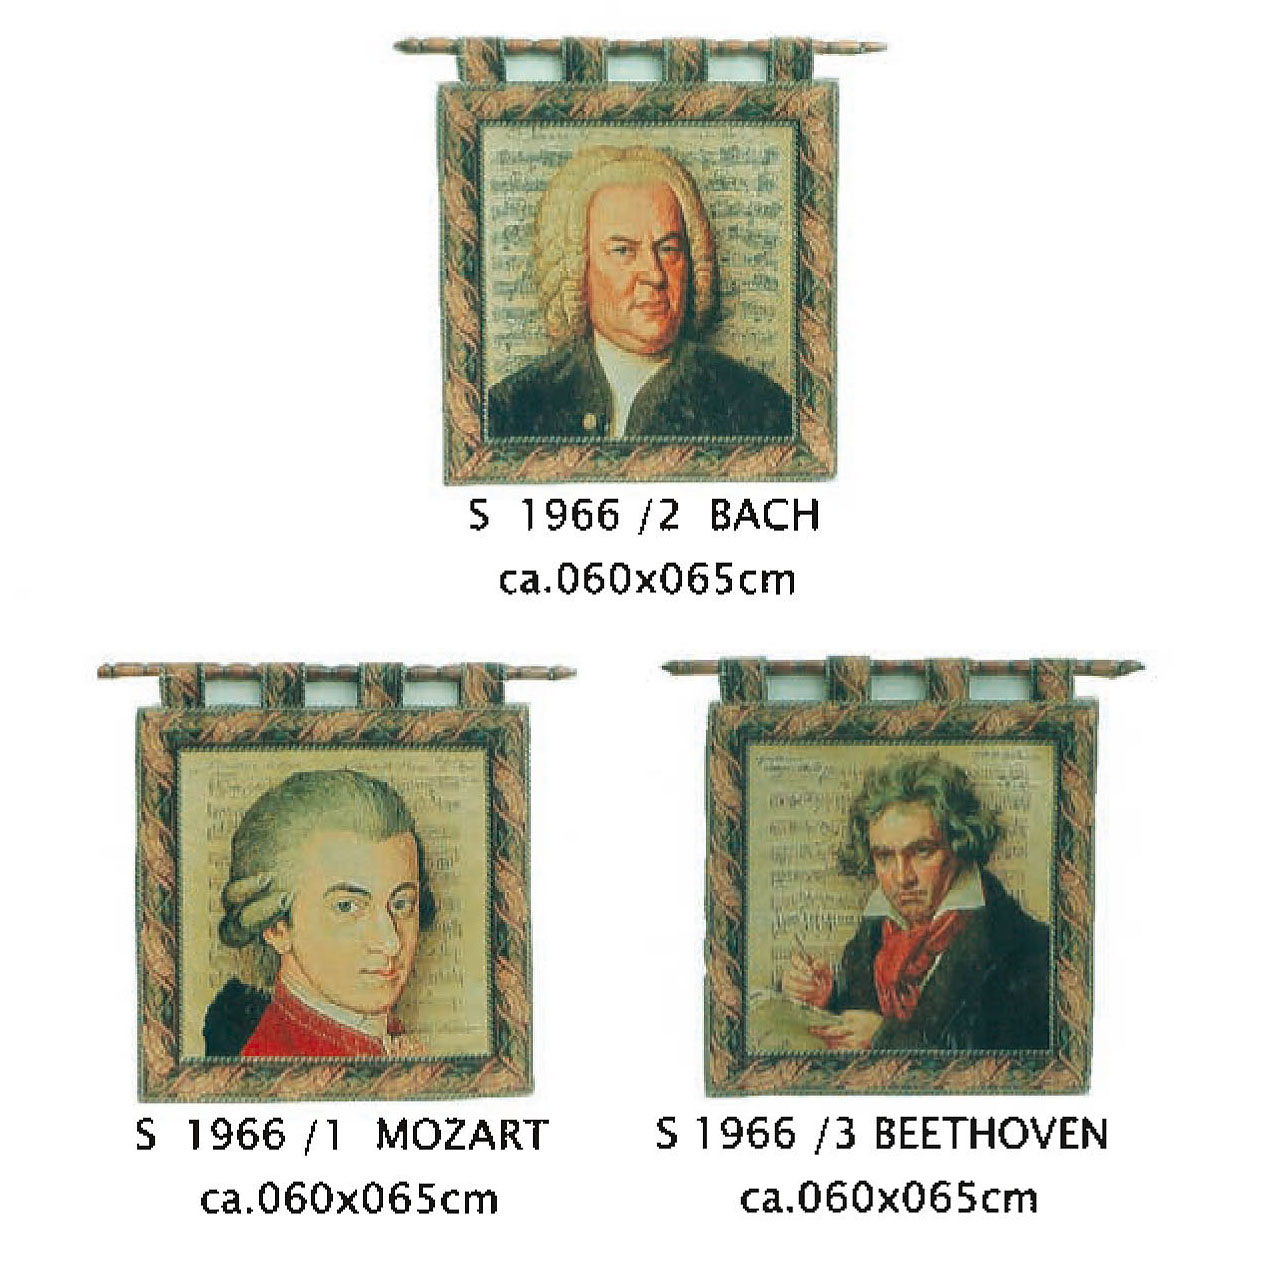 Luka, S1966 х1 Mozart , х2 Bach, х3 Beethoven <br> Гобелен Моцарт, Бах, Бетховен <br>размер 060х065